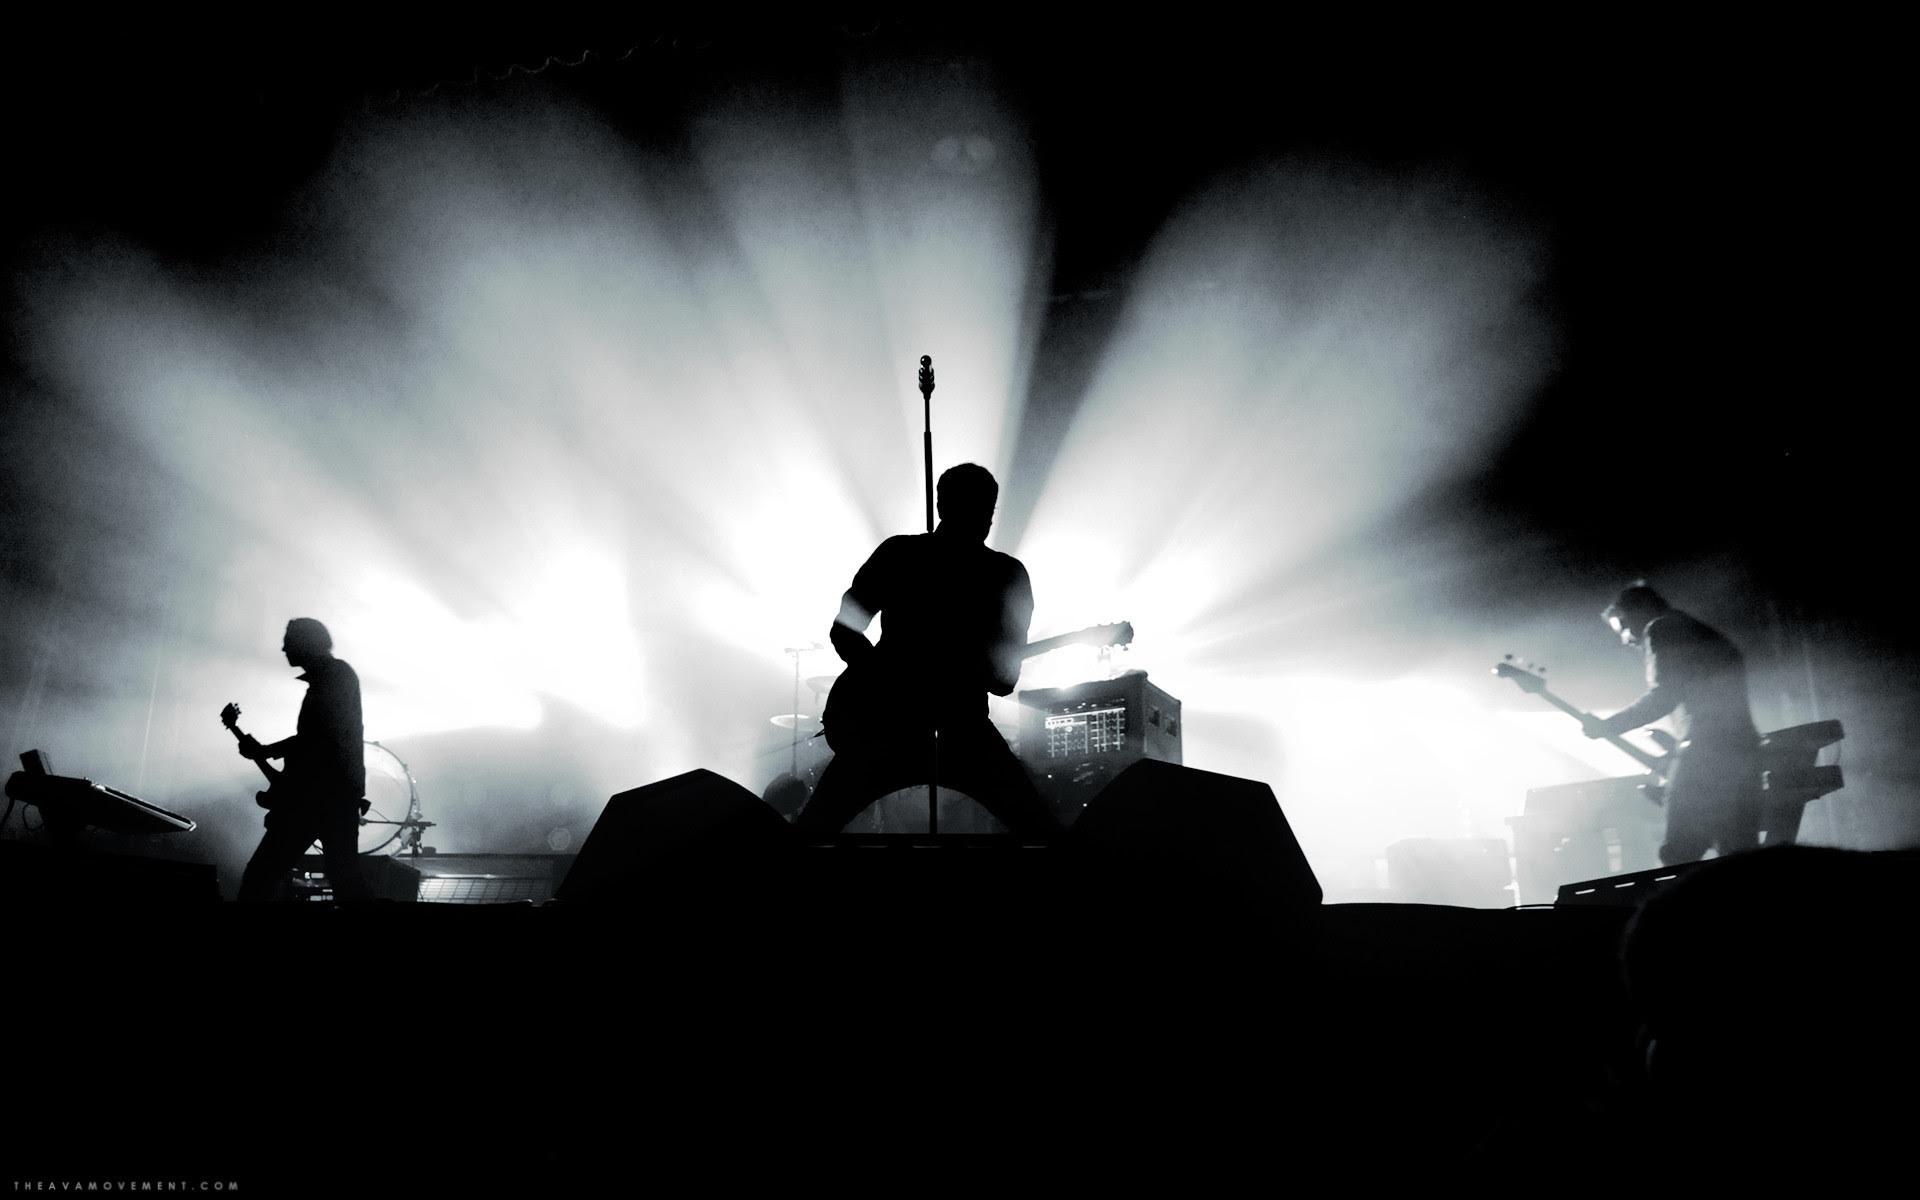 Concert Stage Wallpaper (65+ images)